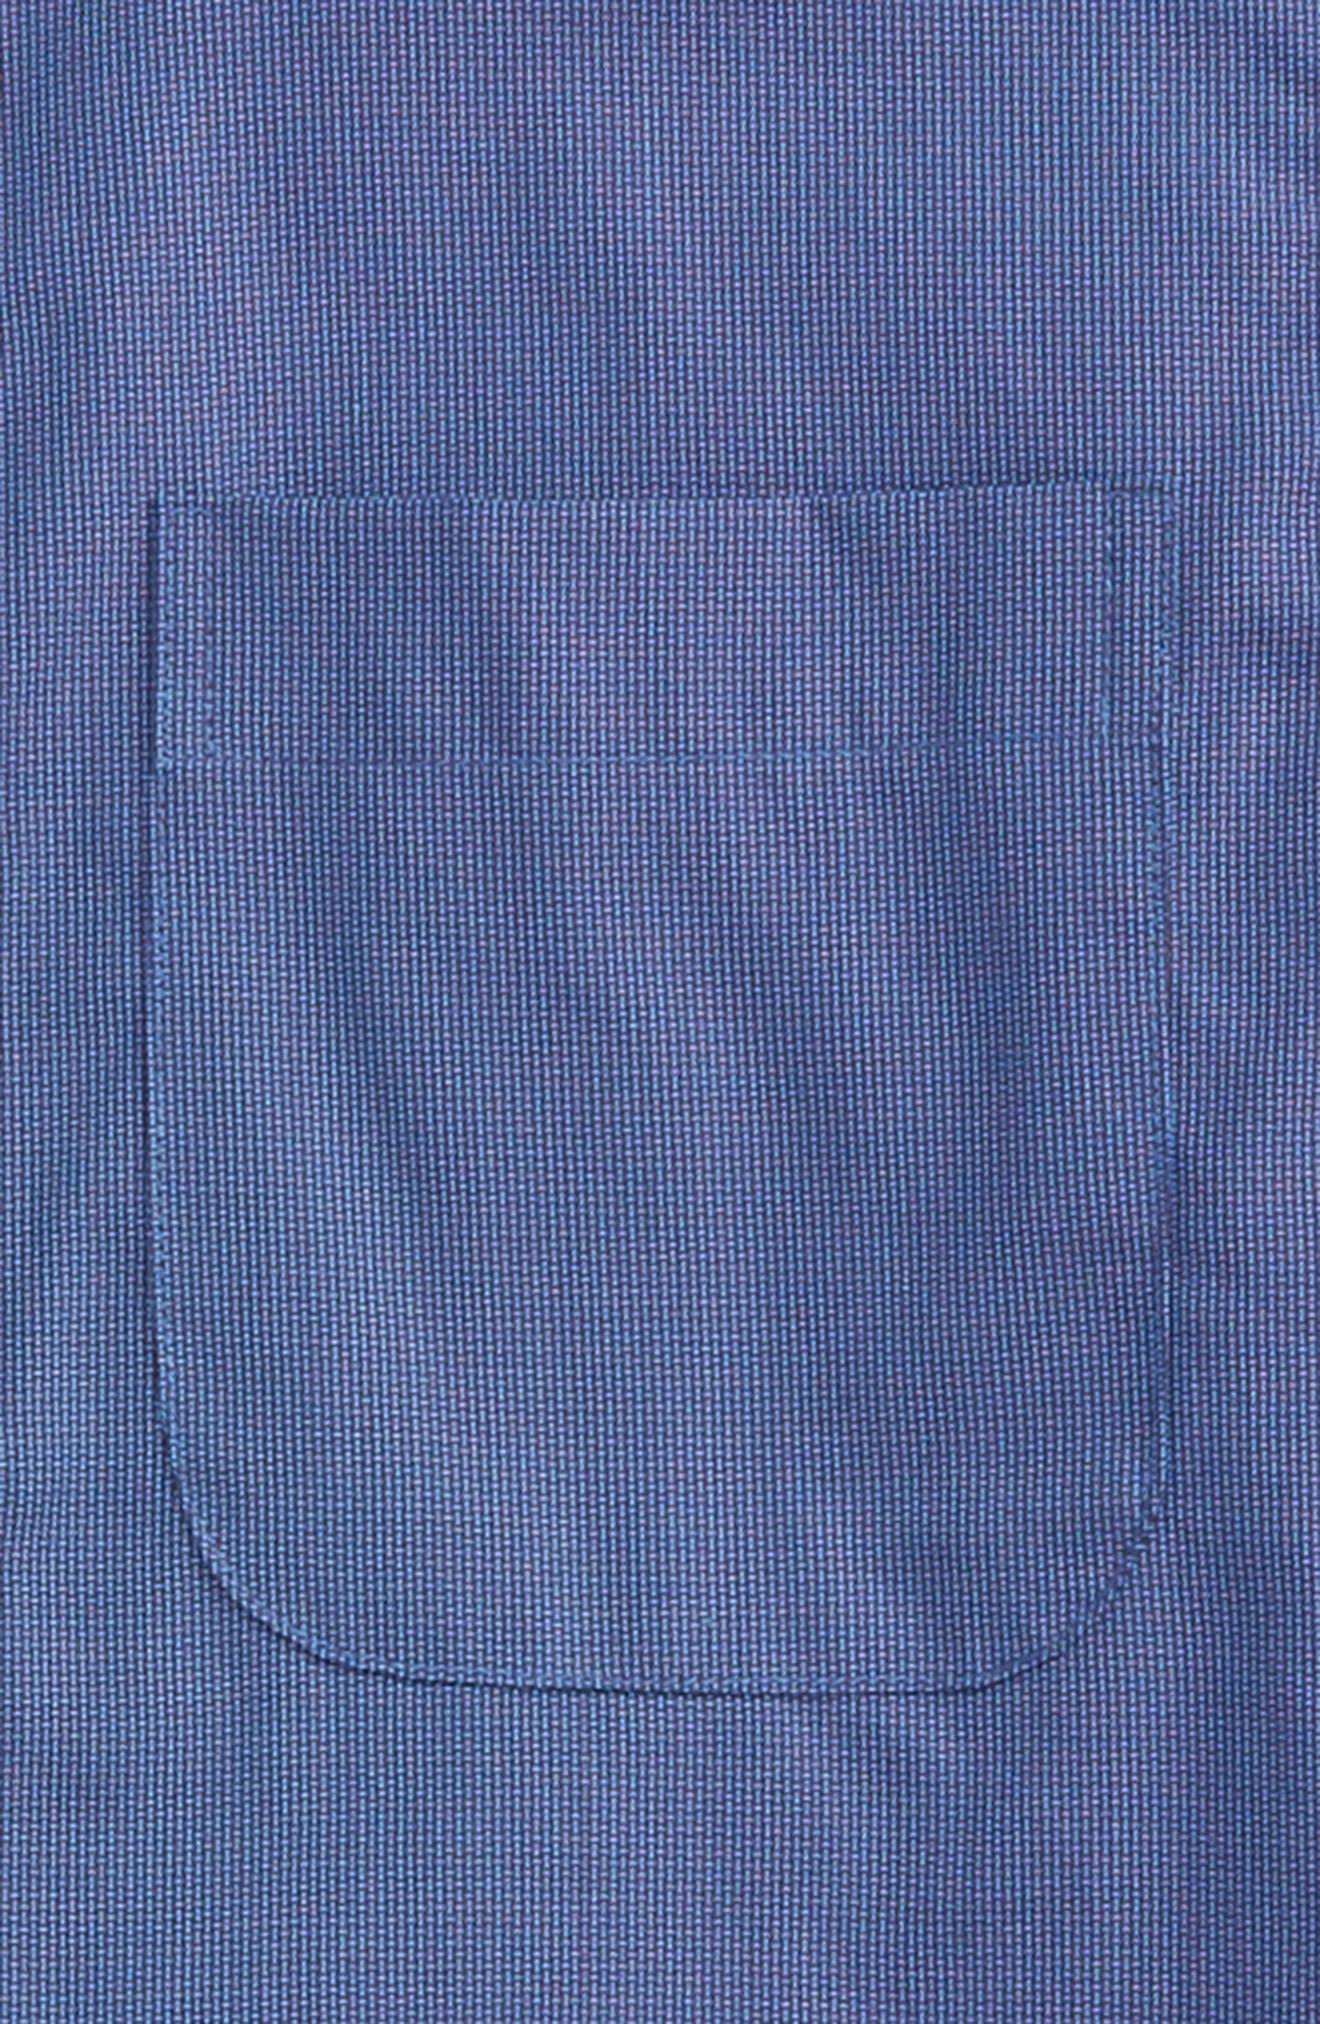 Patriot Cotton Poplin Dress Shirt,                             Alternate thumbnail 2, color,                             410